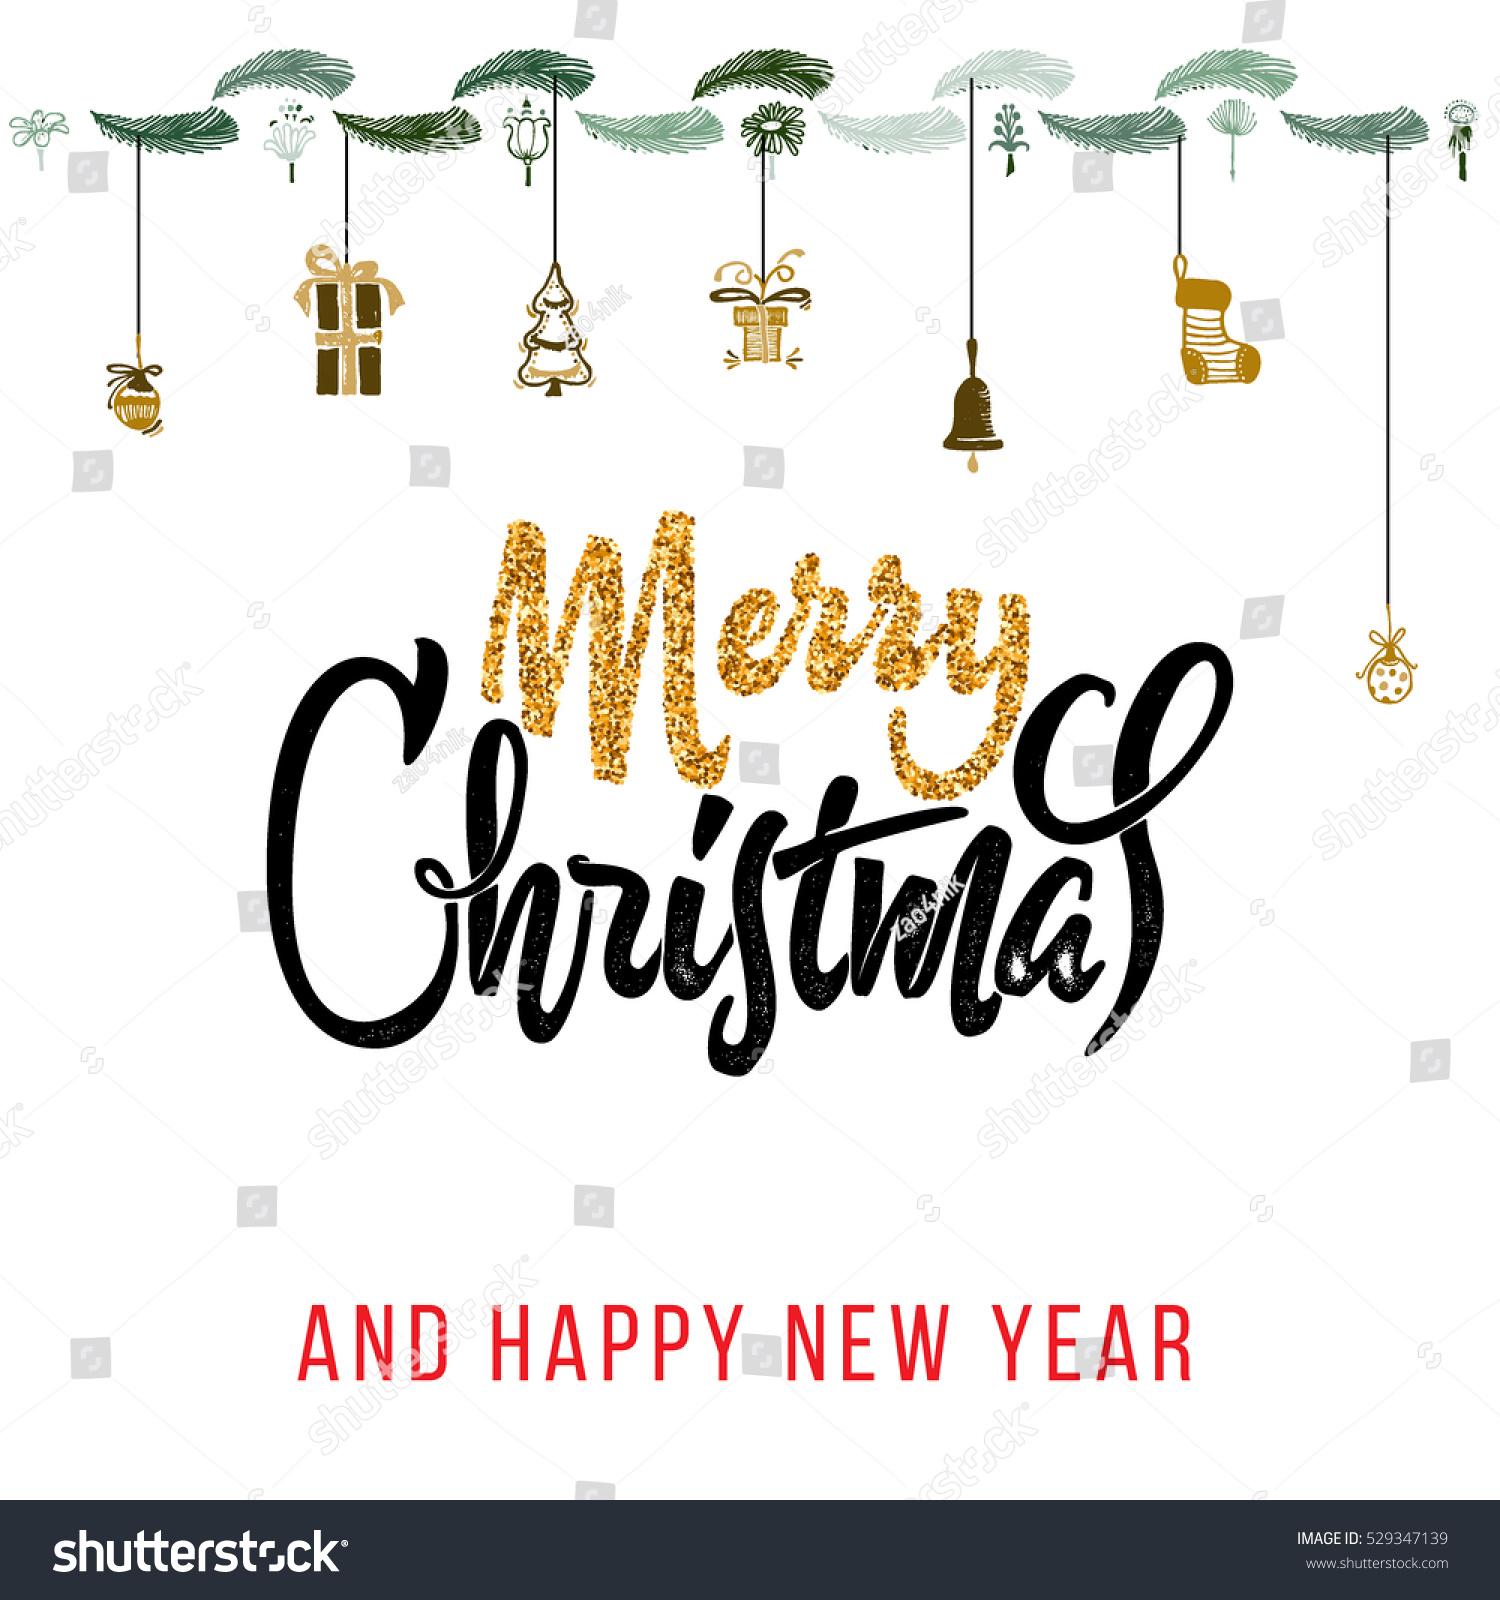 Merry christmas happy new year stock vector